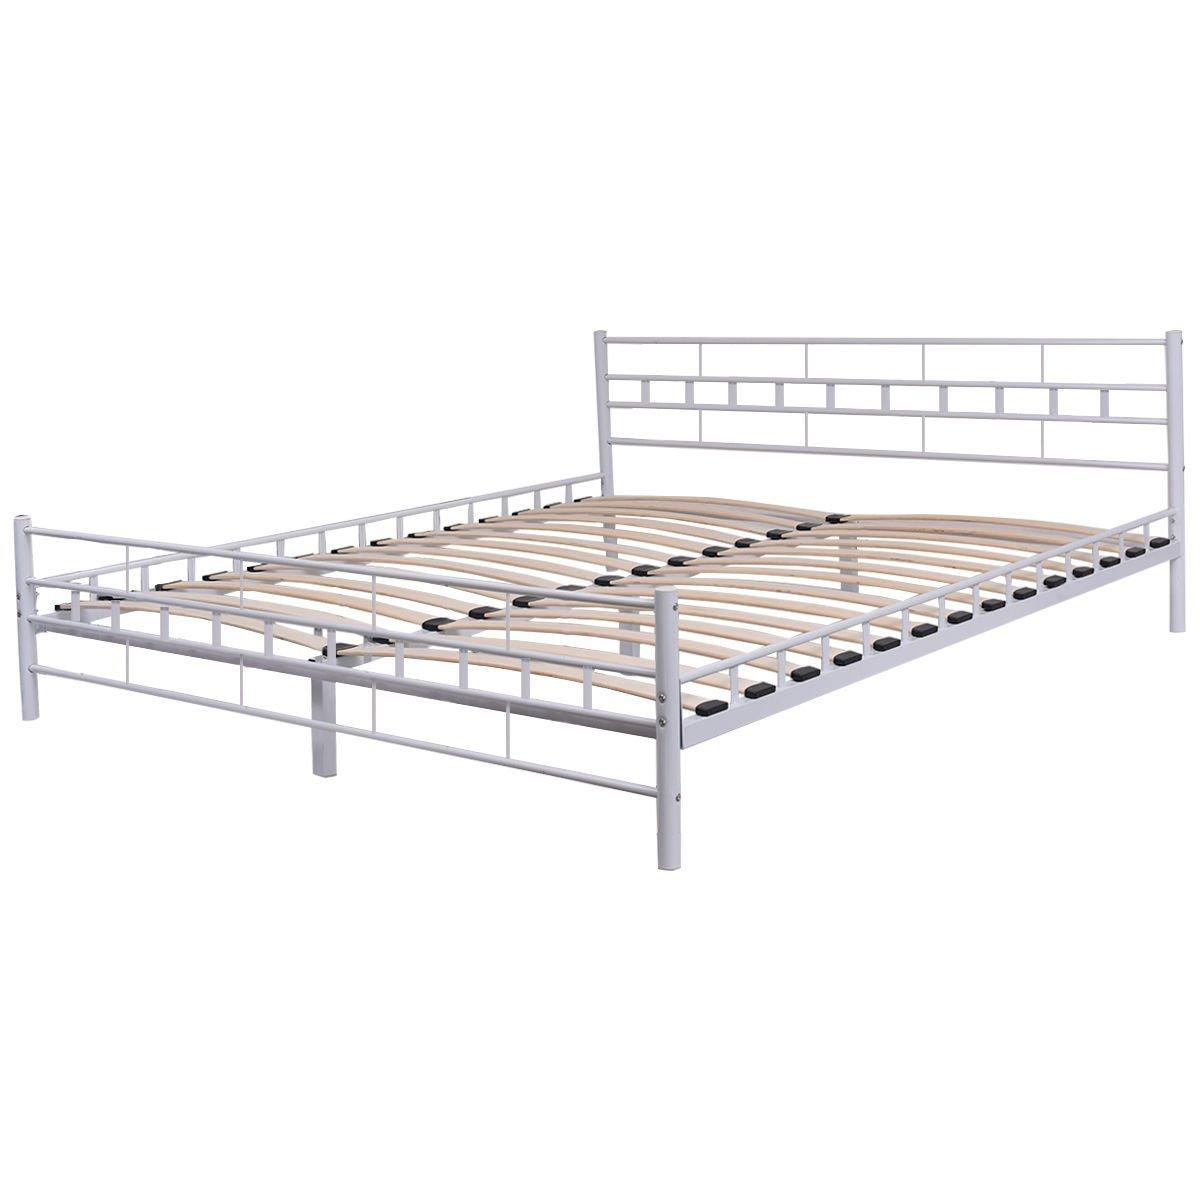 Giantex Platform Metal Bed Frame with Headboard Footboard Wooden Slat Support Mattress Foundation, Queen